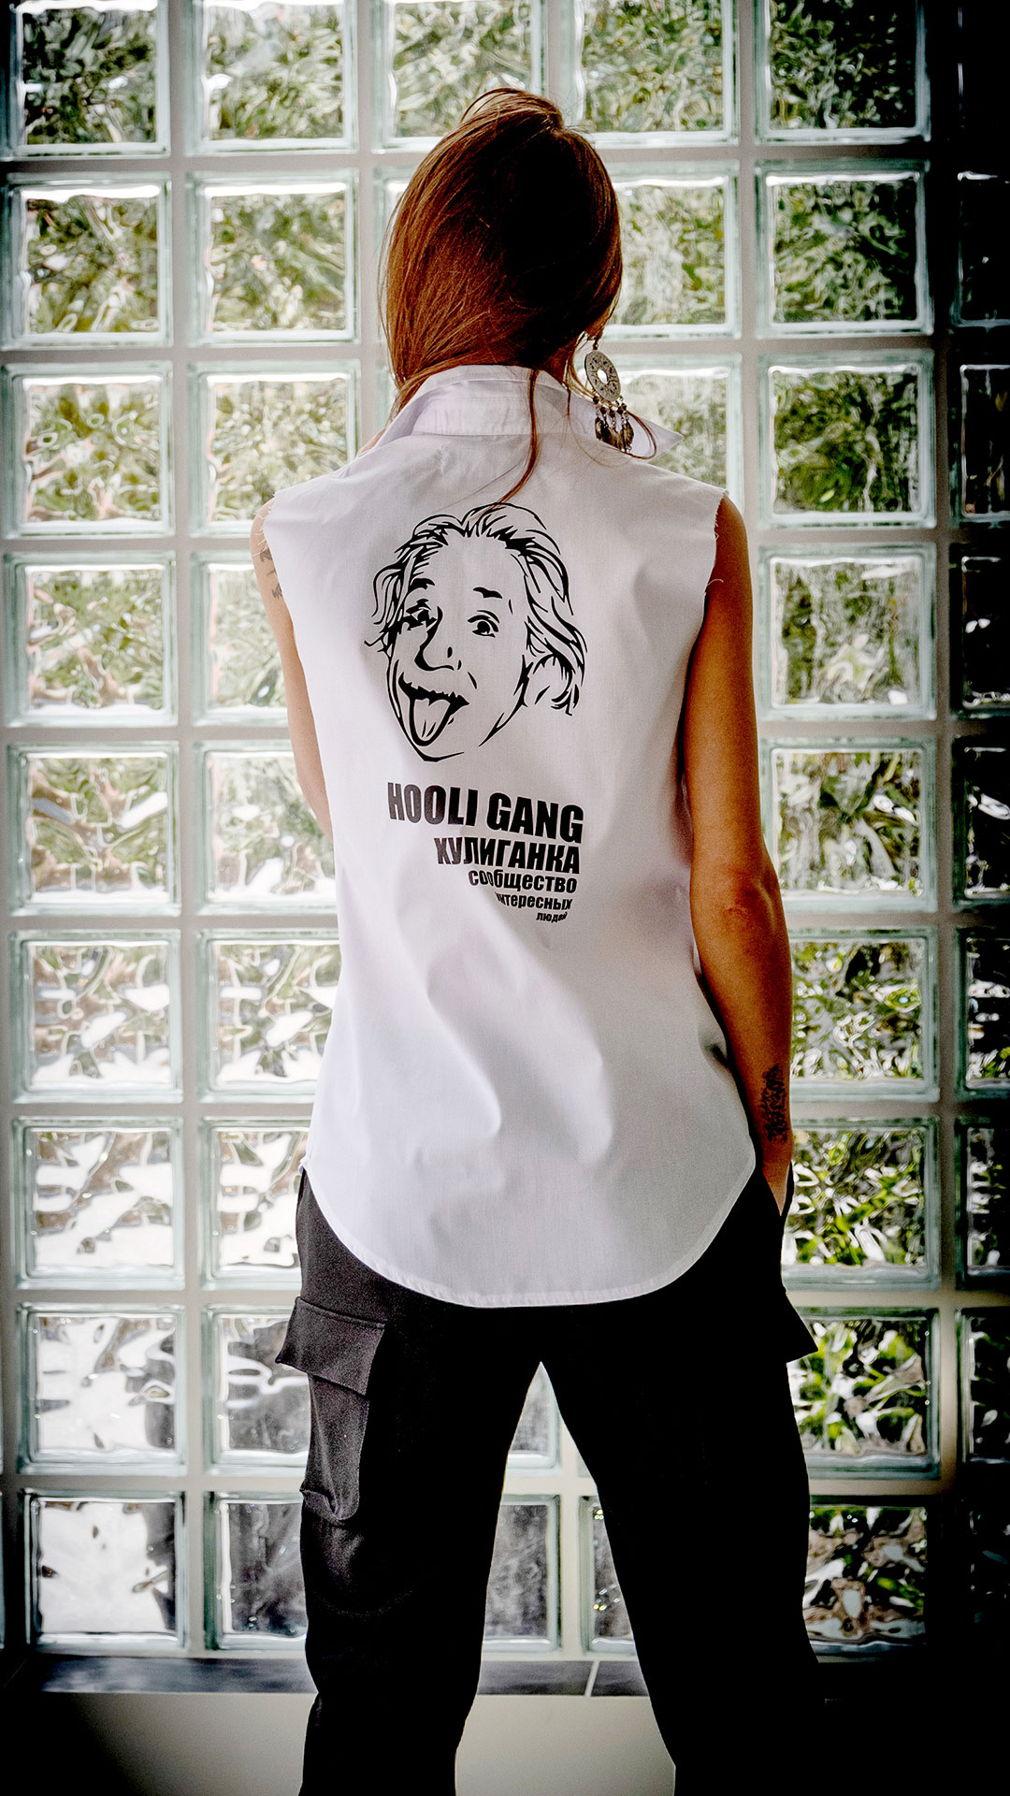 Рубашка без рукавов HooliGang